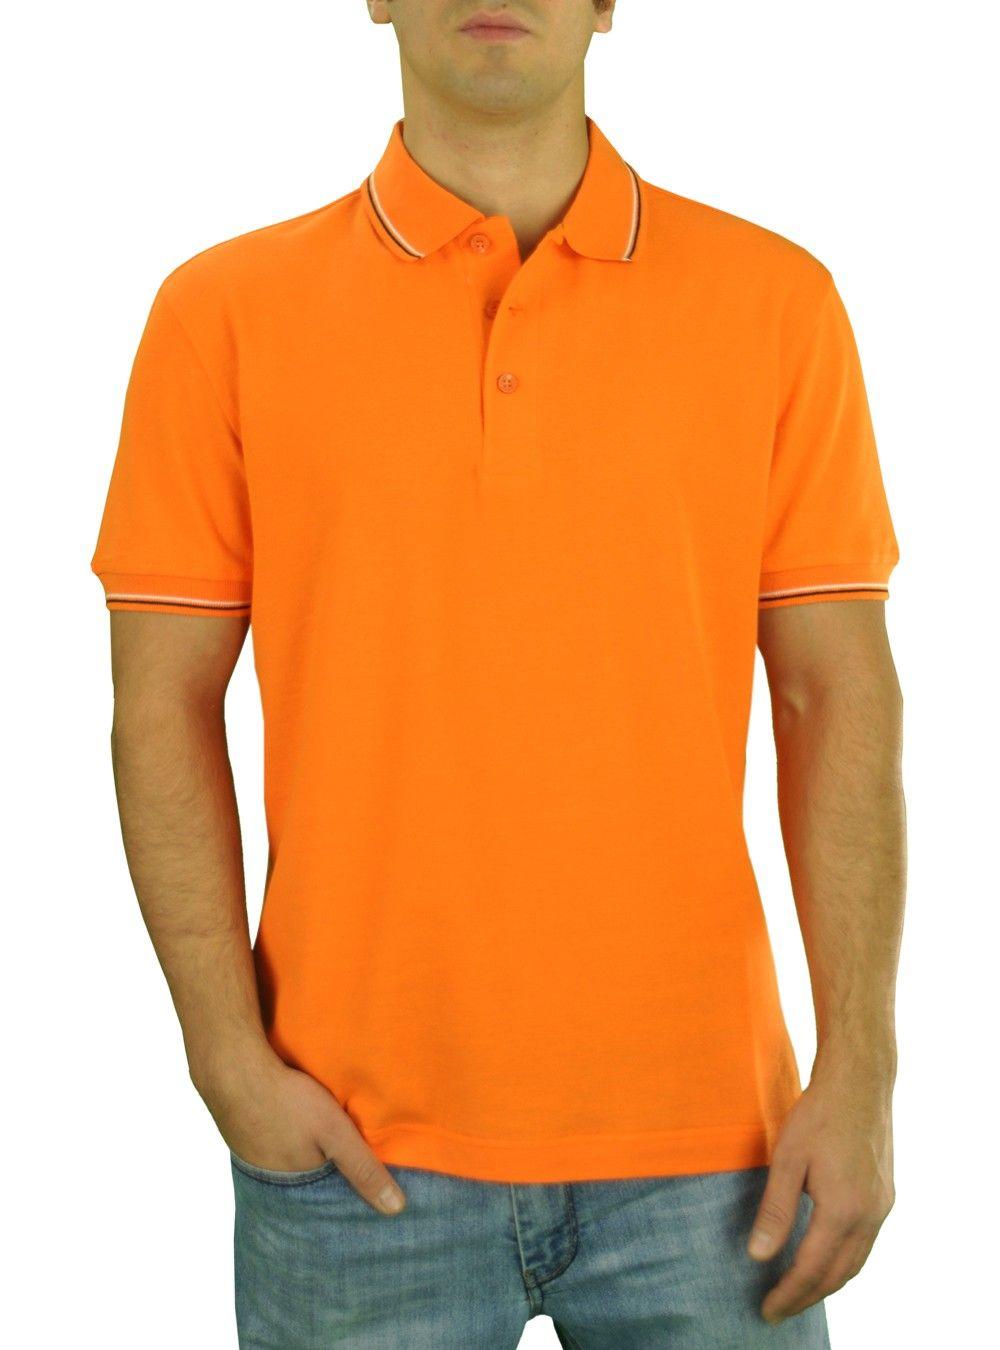 60 Cotton 40 Poly, Fashion color designed polo shirt